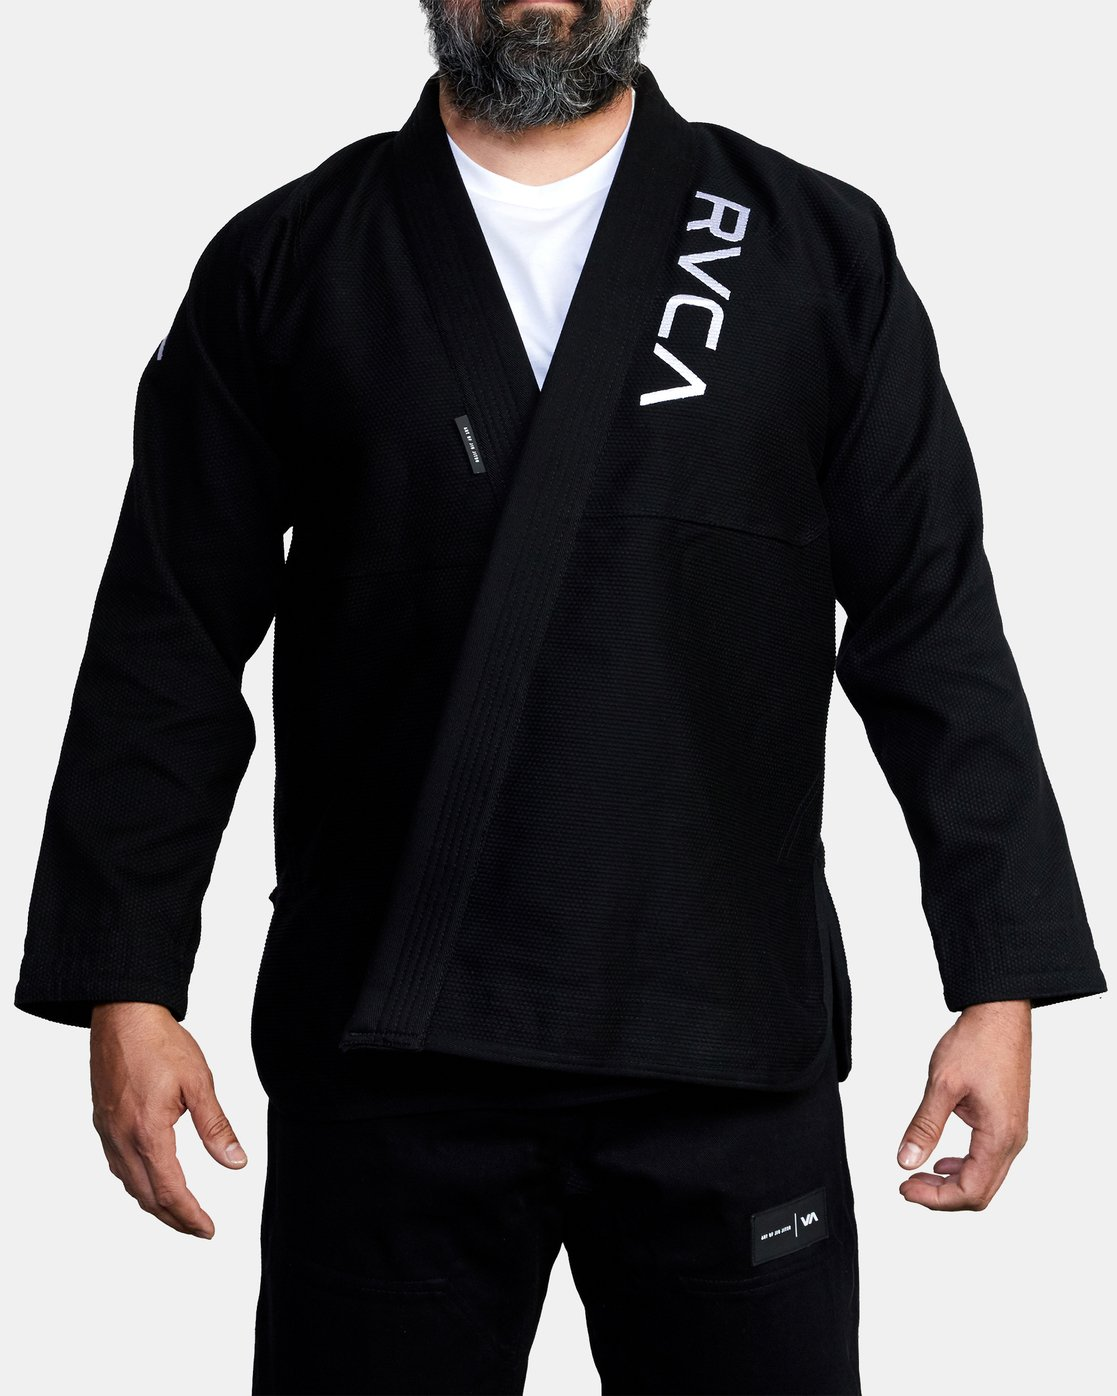 16 Art of Jiu Jitsu - Jiu Jitsu Gi pour Homme Noir R4ESRARVW9 RVCA